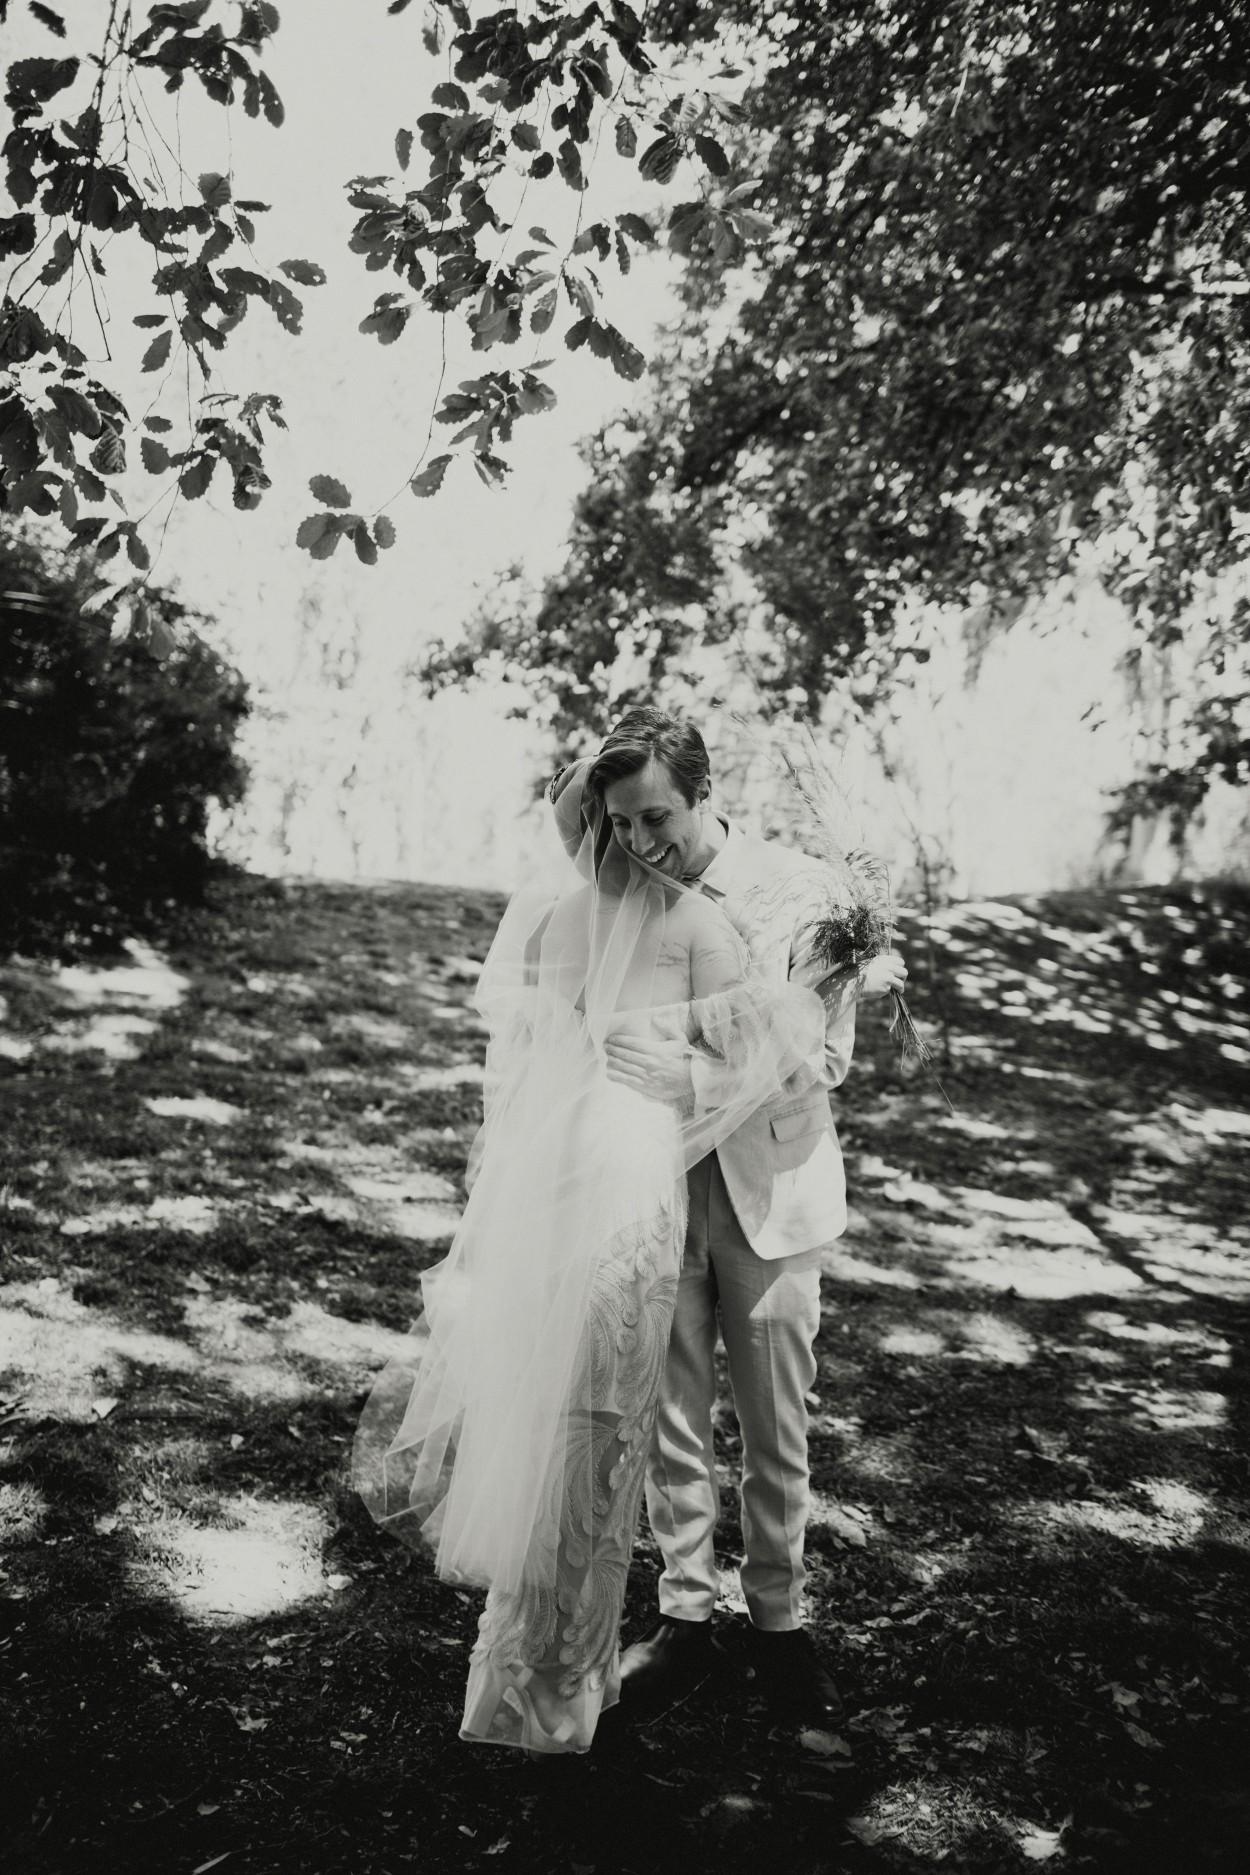 I-Got-You-Babe-Weddings-Heide-Museum-of-Modern-Art-Elopement-Susie-Nathan012.jpg